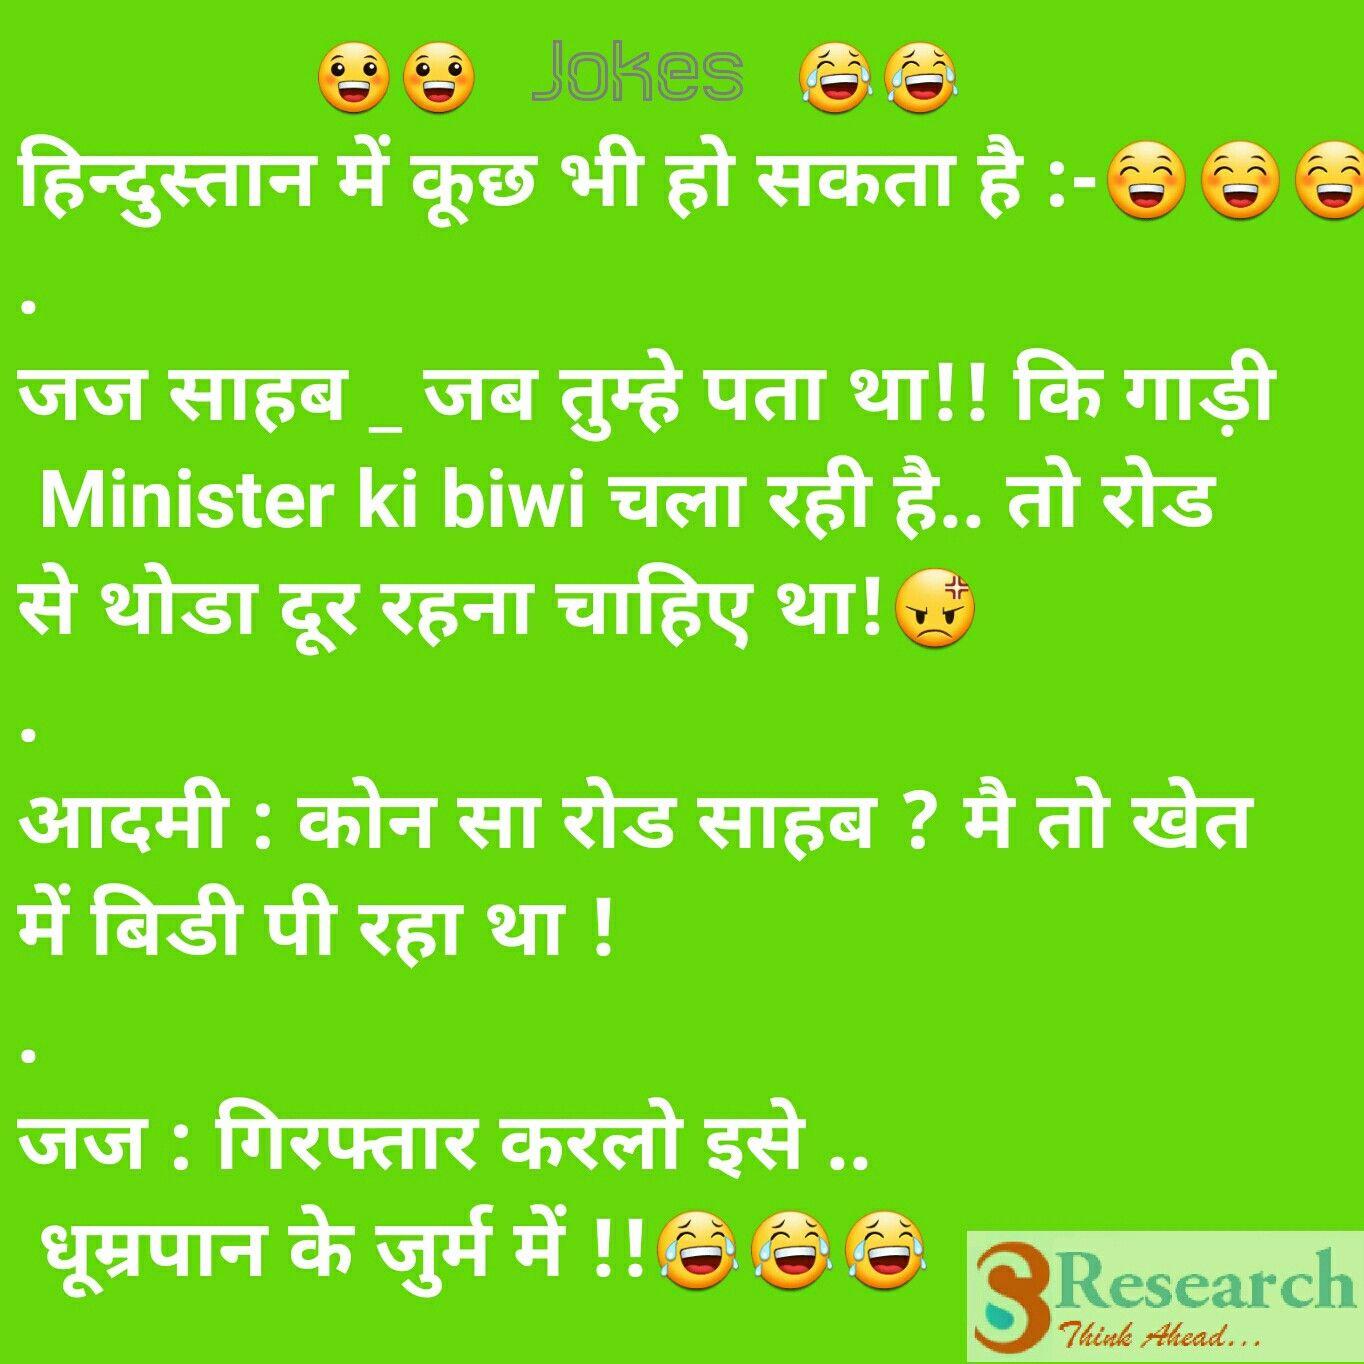 Pin By Ashok On Funny Funny Jokes In Hindi